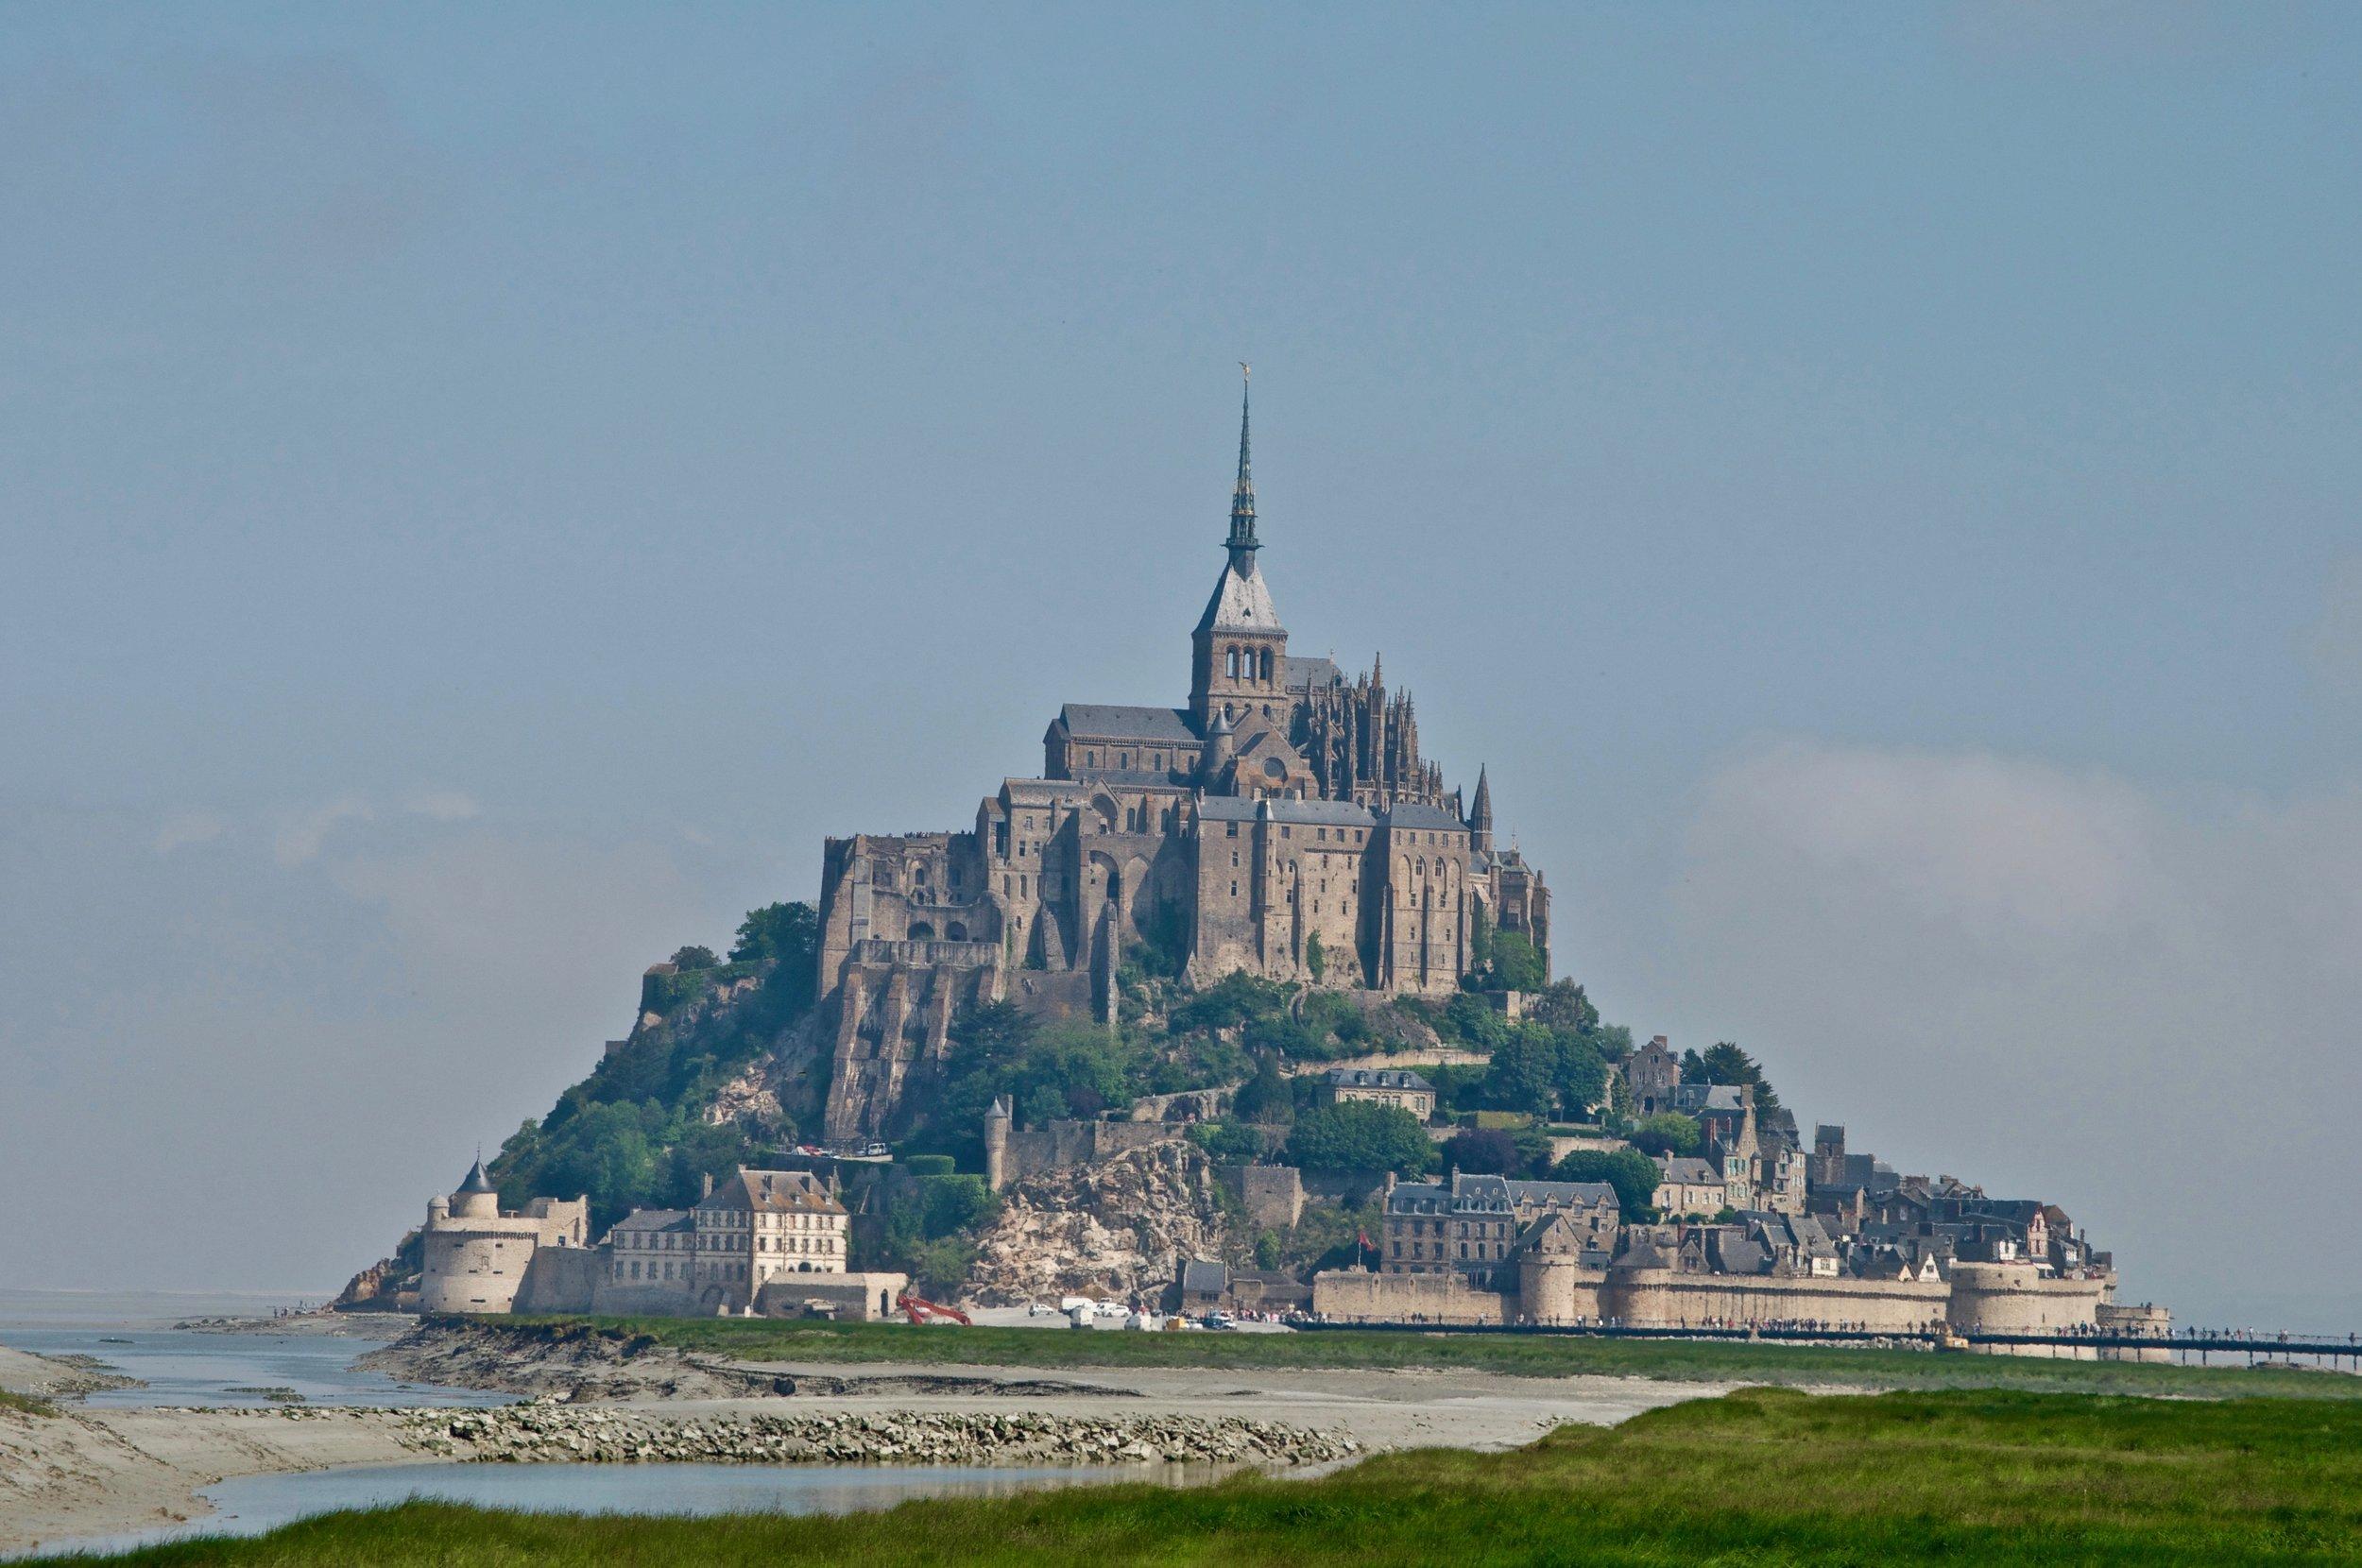 Mont Saint-Michel - Ultimate Northern France Itinerary #montsaintmichel #france